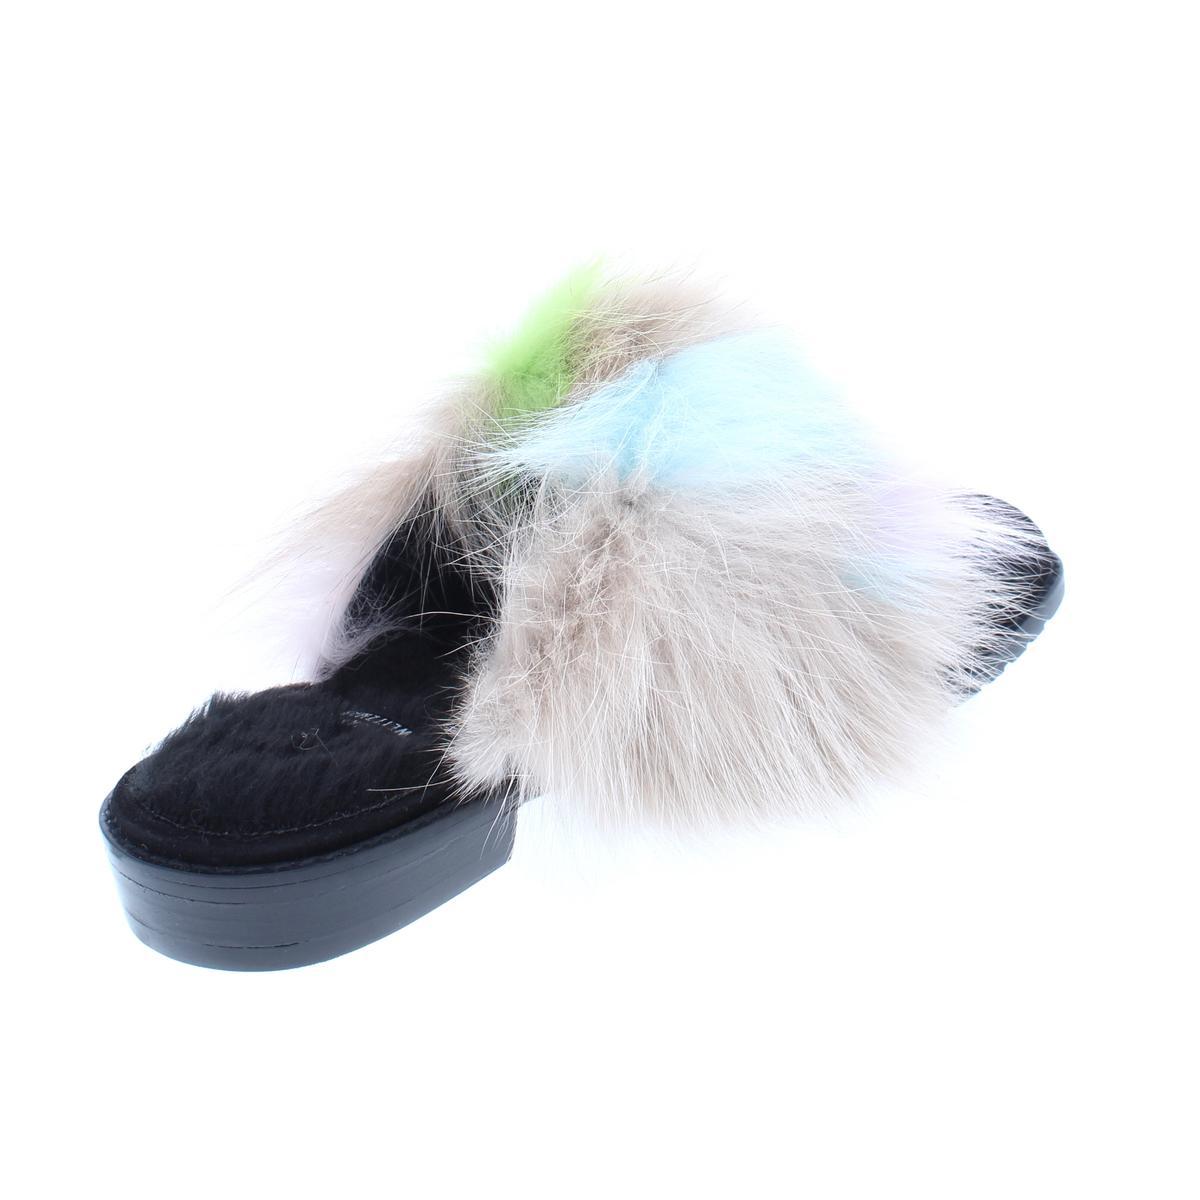 Stuart-Weitzman-Womens-Furgetit-Suede-Fox-Fur-Slide-Mules-Shoes-BHFO-8240 thumbnail 9